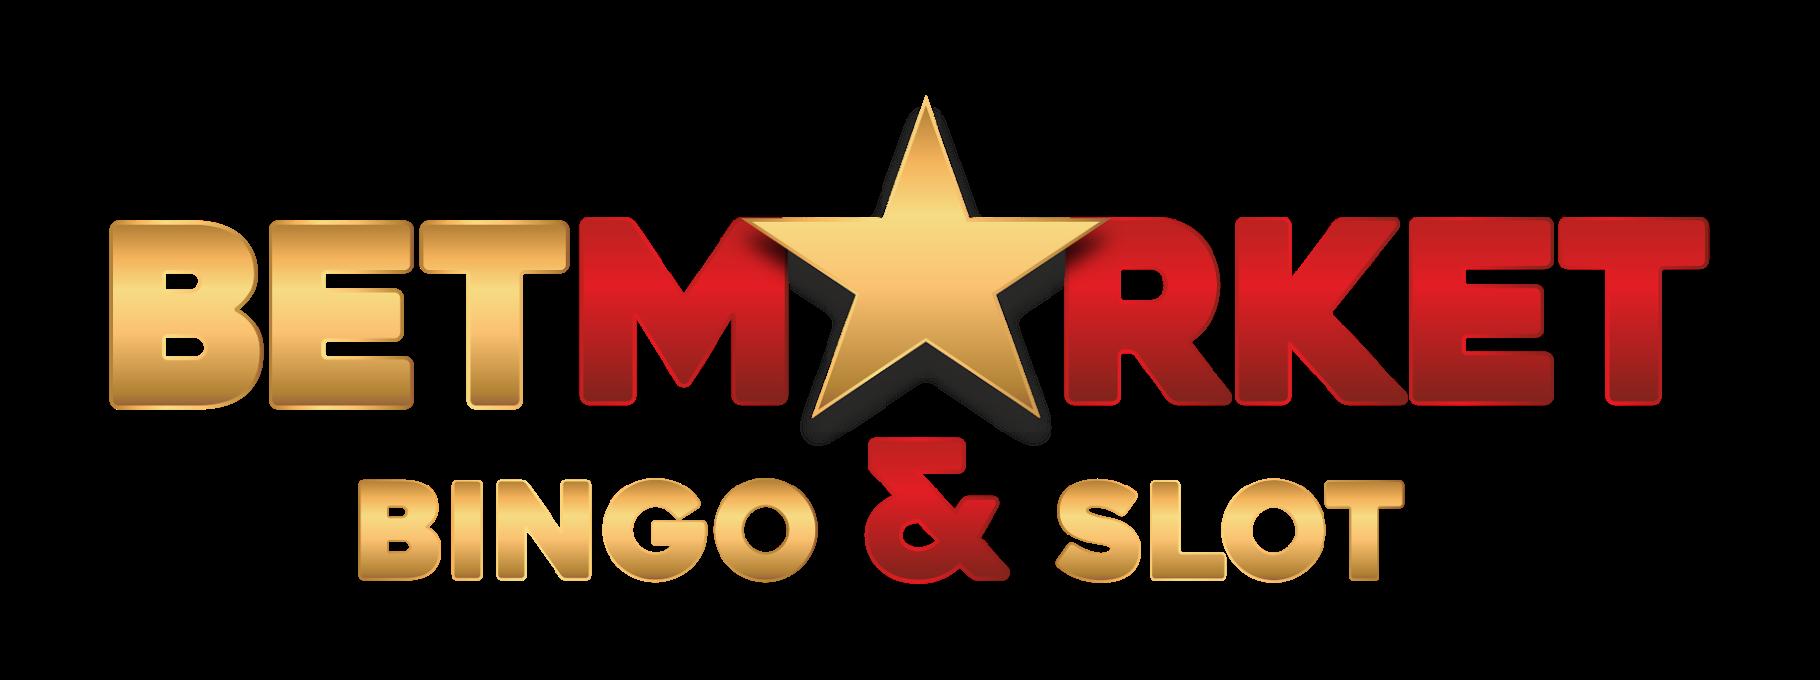 Betmarket - Bingo & Slot